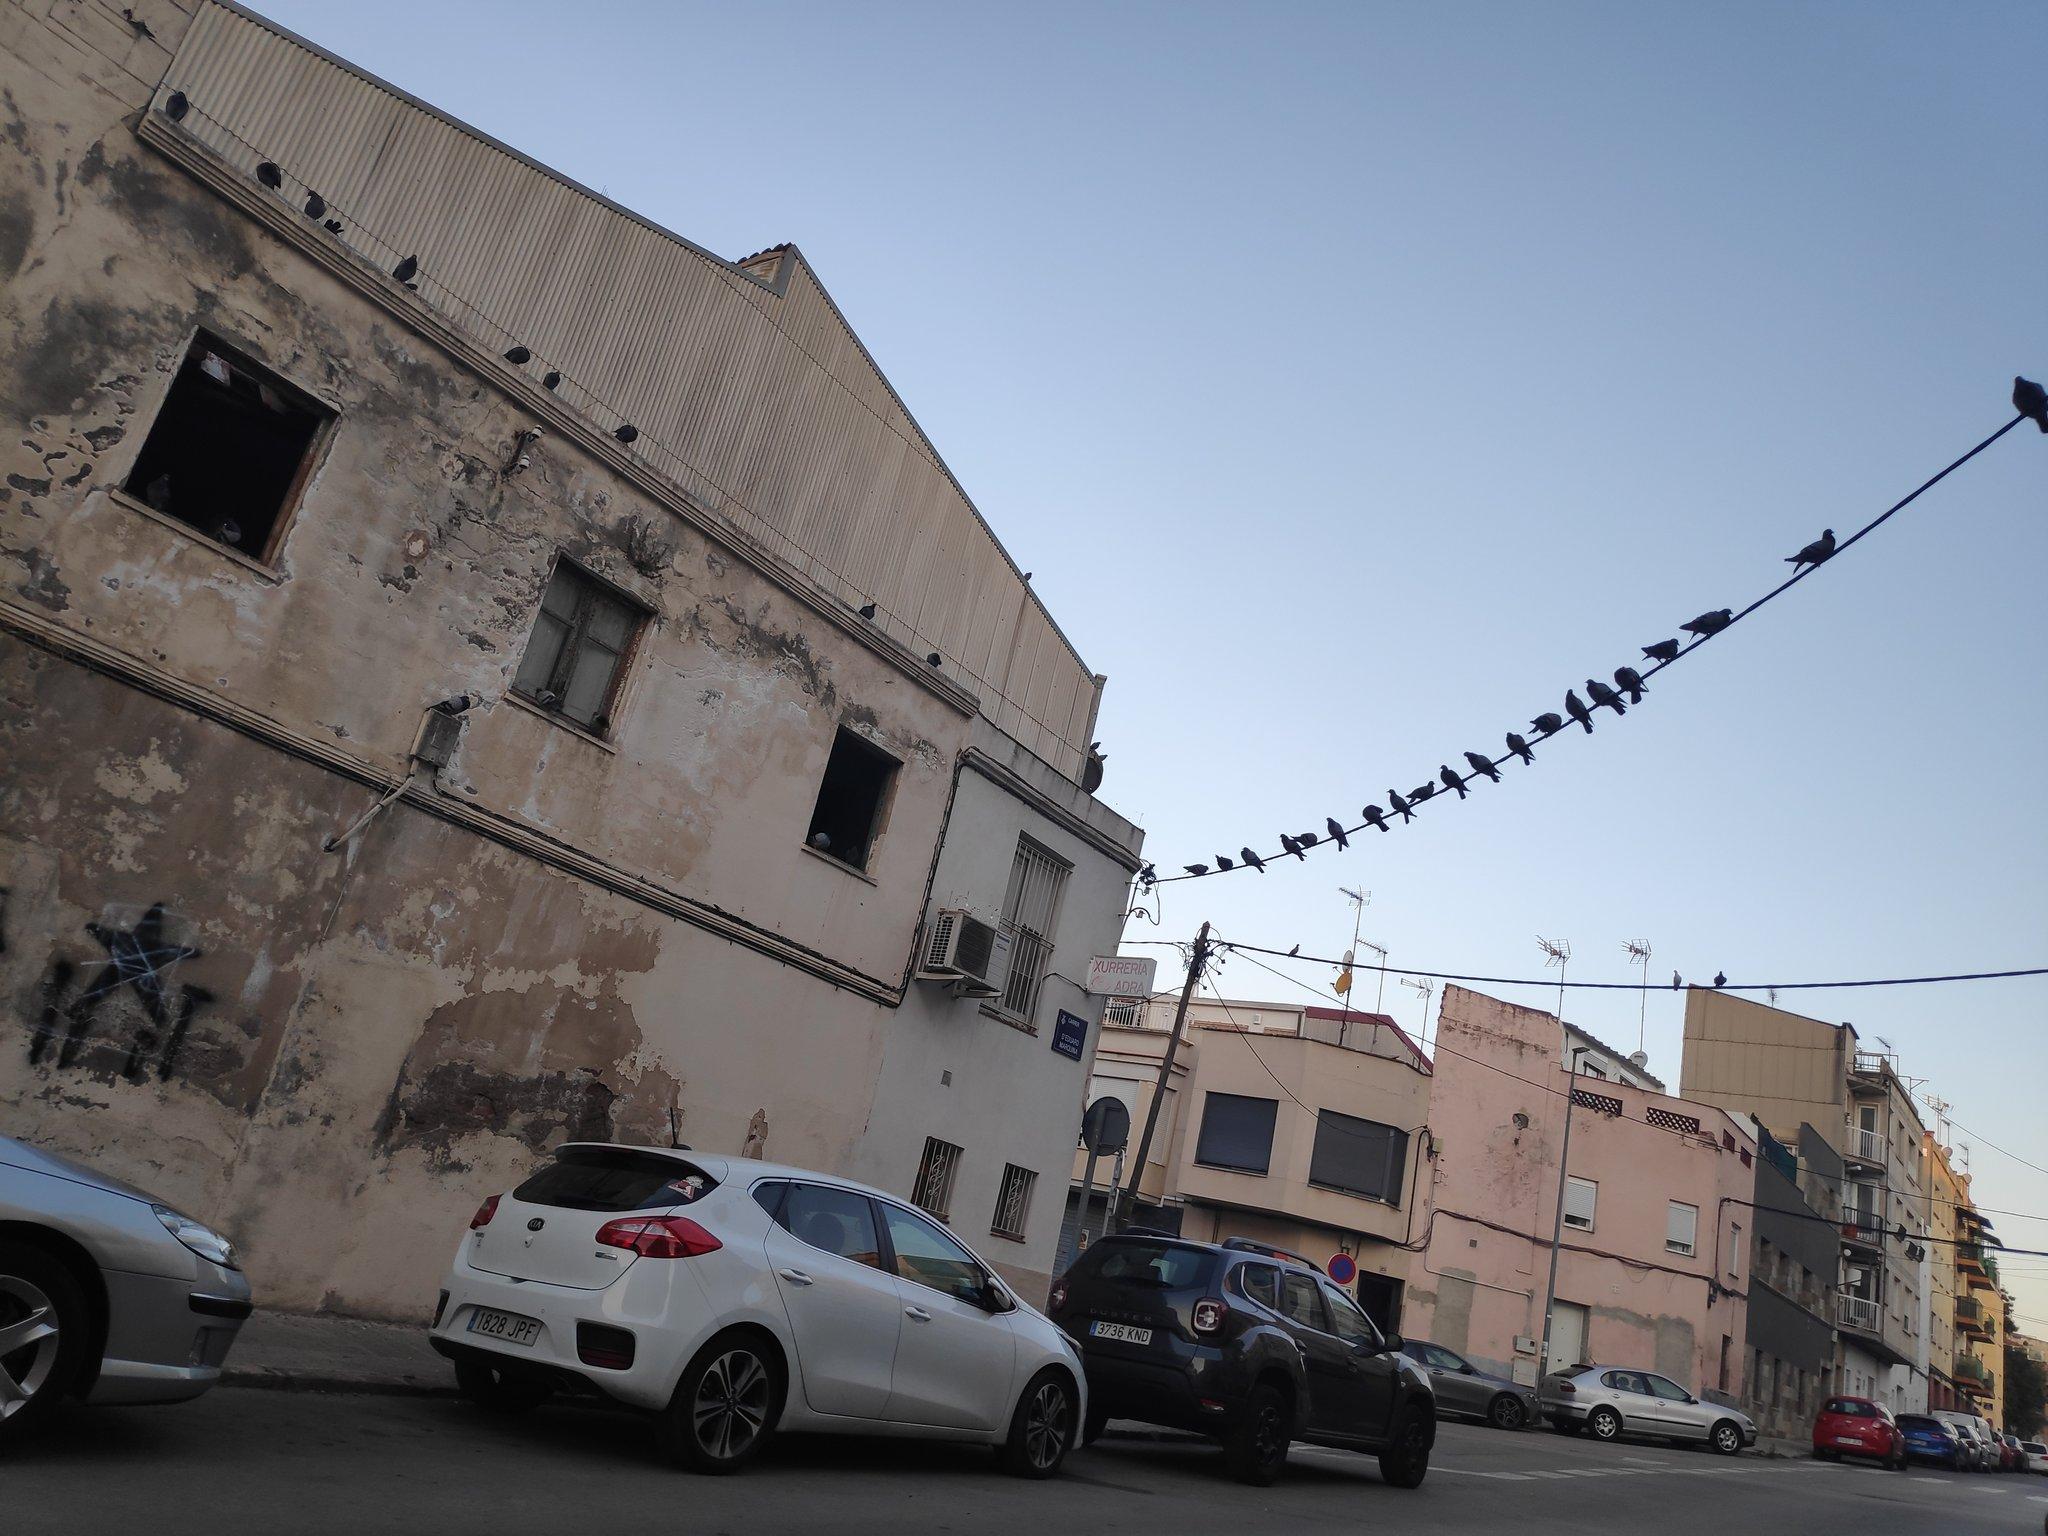 Plaga de coloms al carrer Eduardo Marquina de Terrassa | Paki Robles